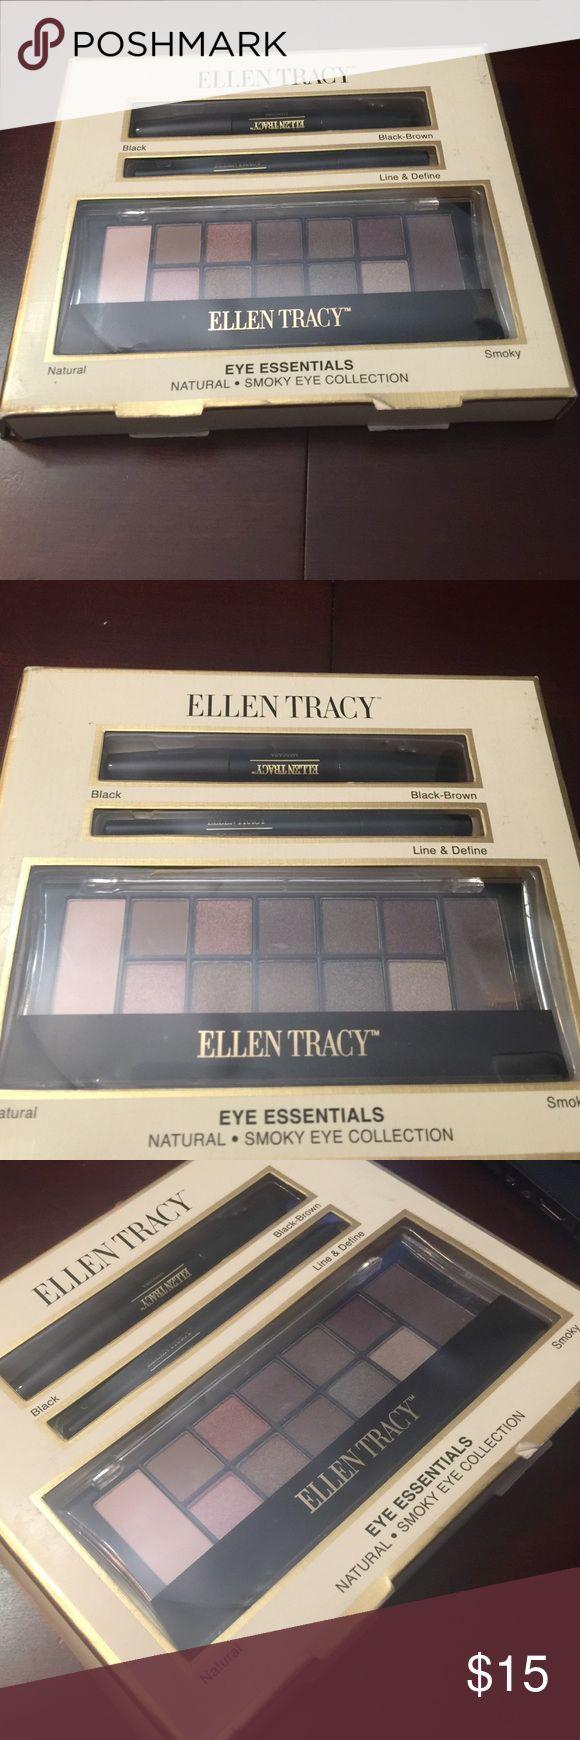 Ellen Tracy Eye Essentials Contains: Duo Mascara ( Black & Black- Brown ) Eyeliner Pencil ( Black ) Eyeshadow Palette with Brush Ellen Tracy Makeup